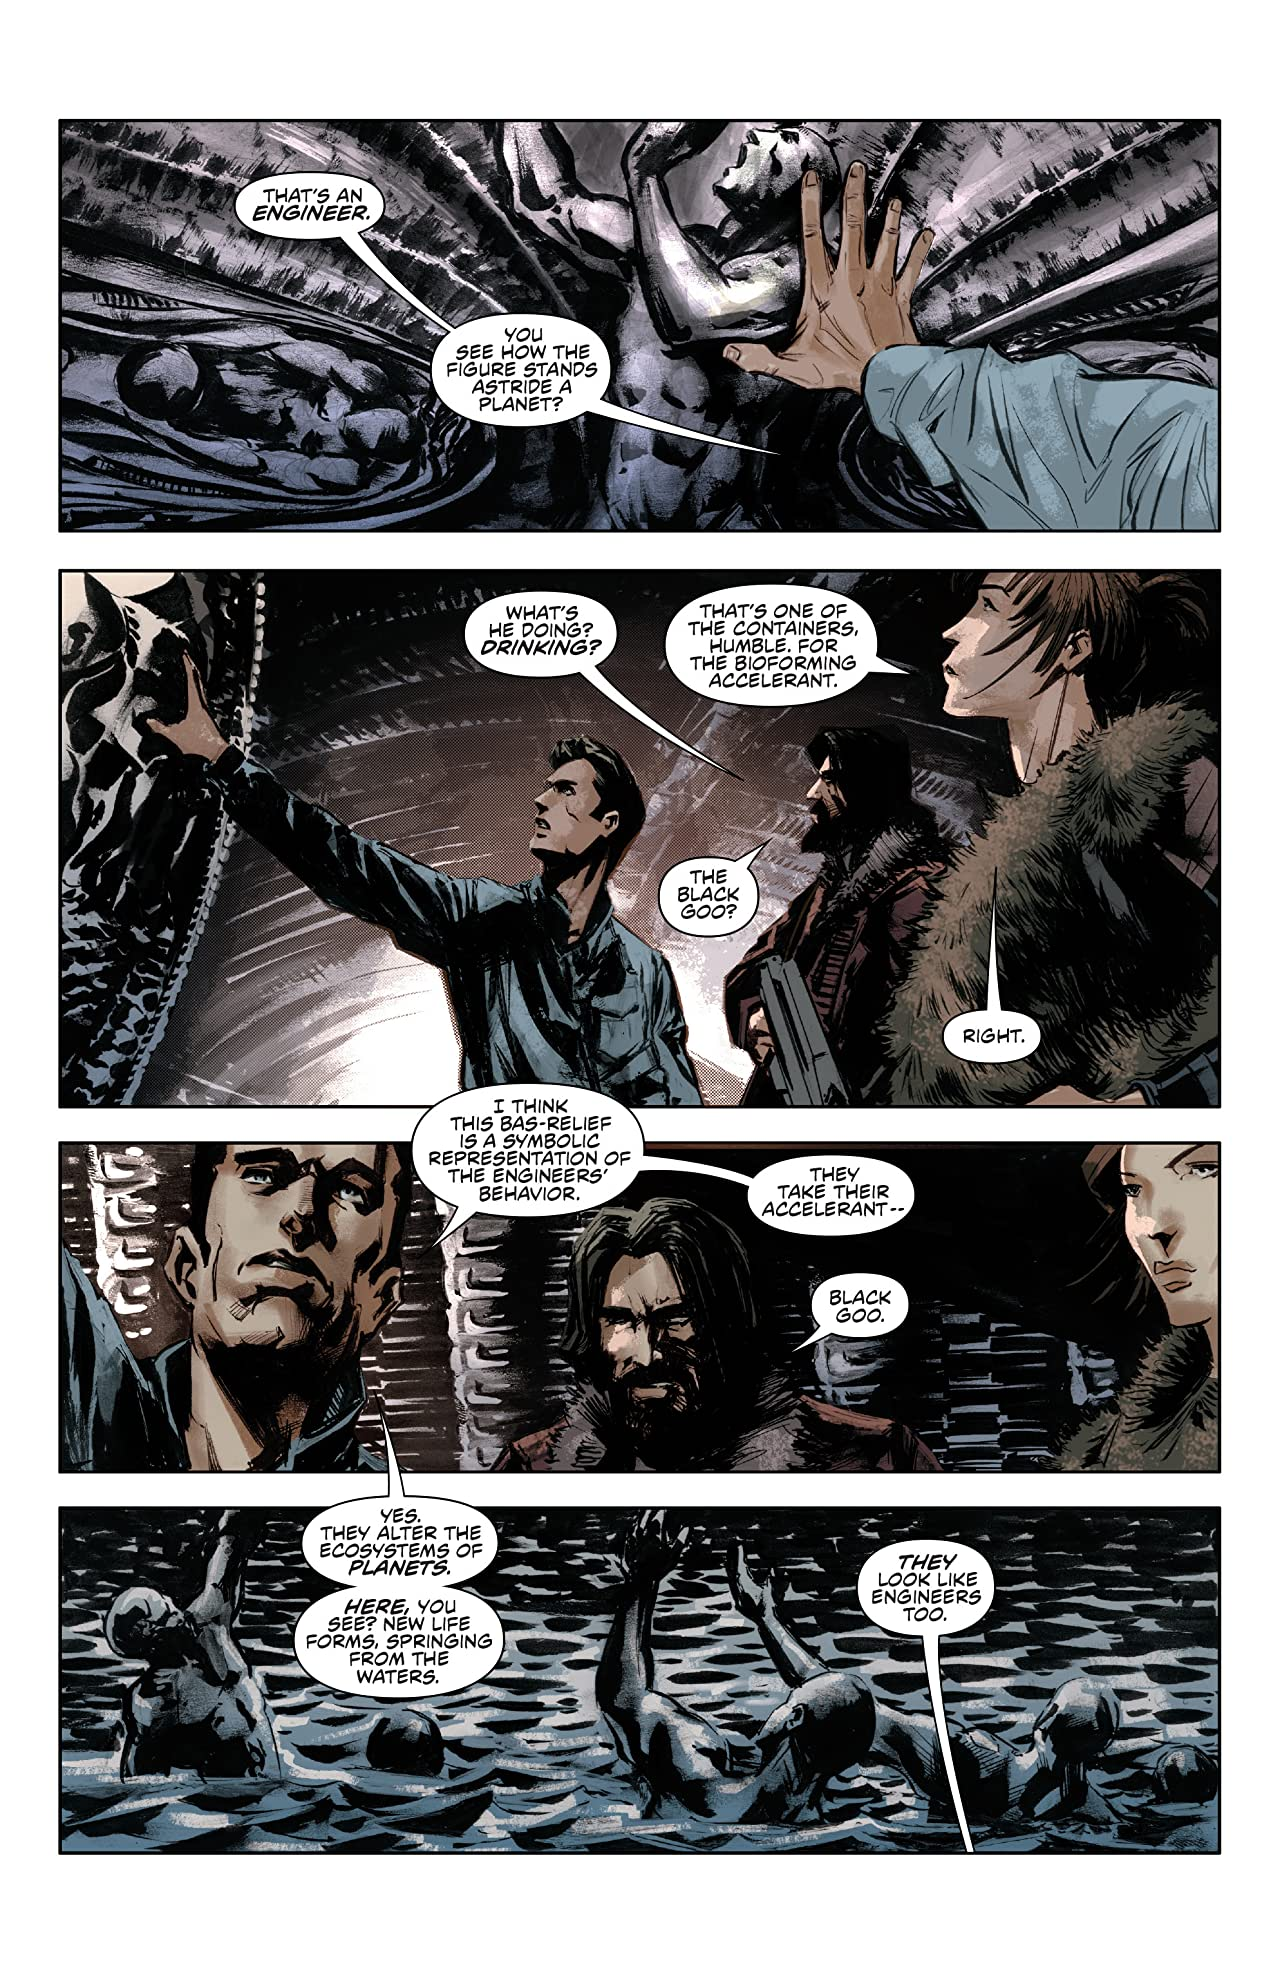 Prometheus: Life and Death (One-shot)